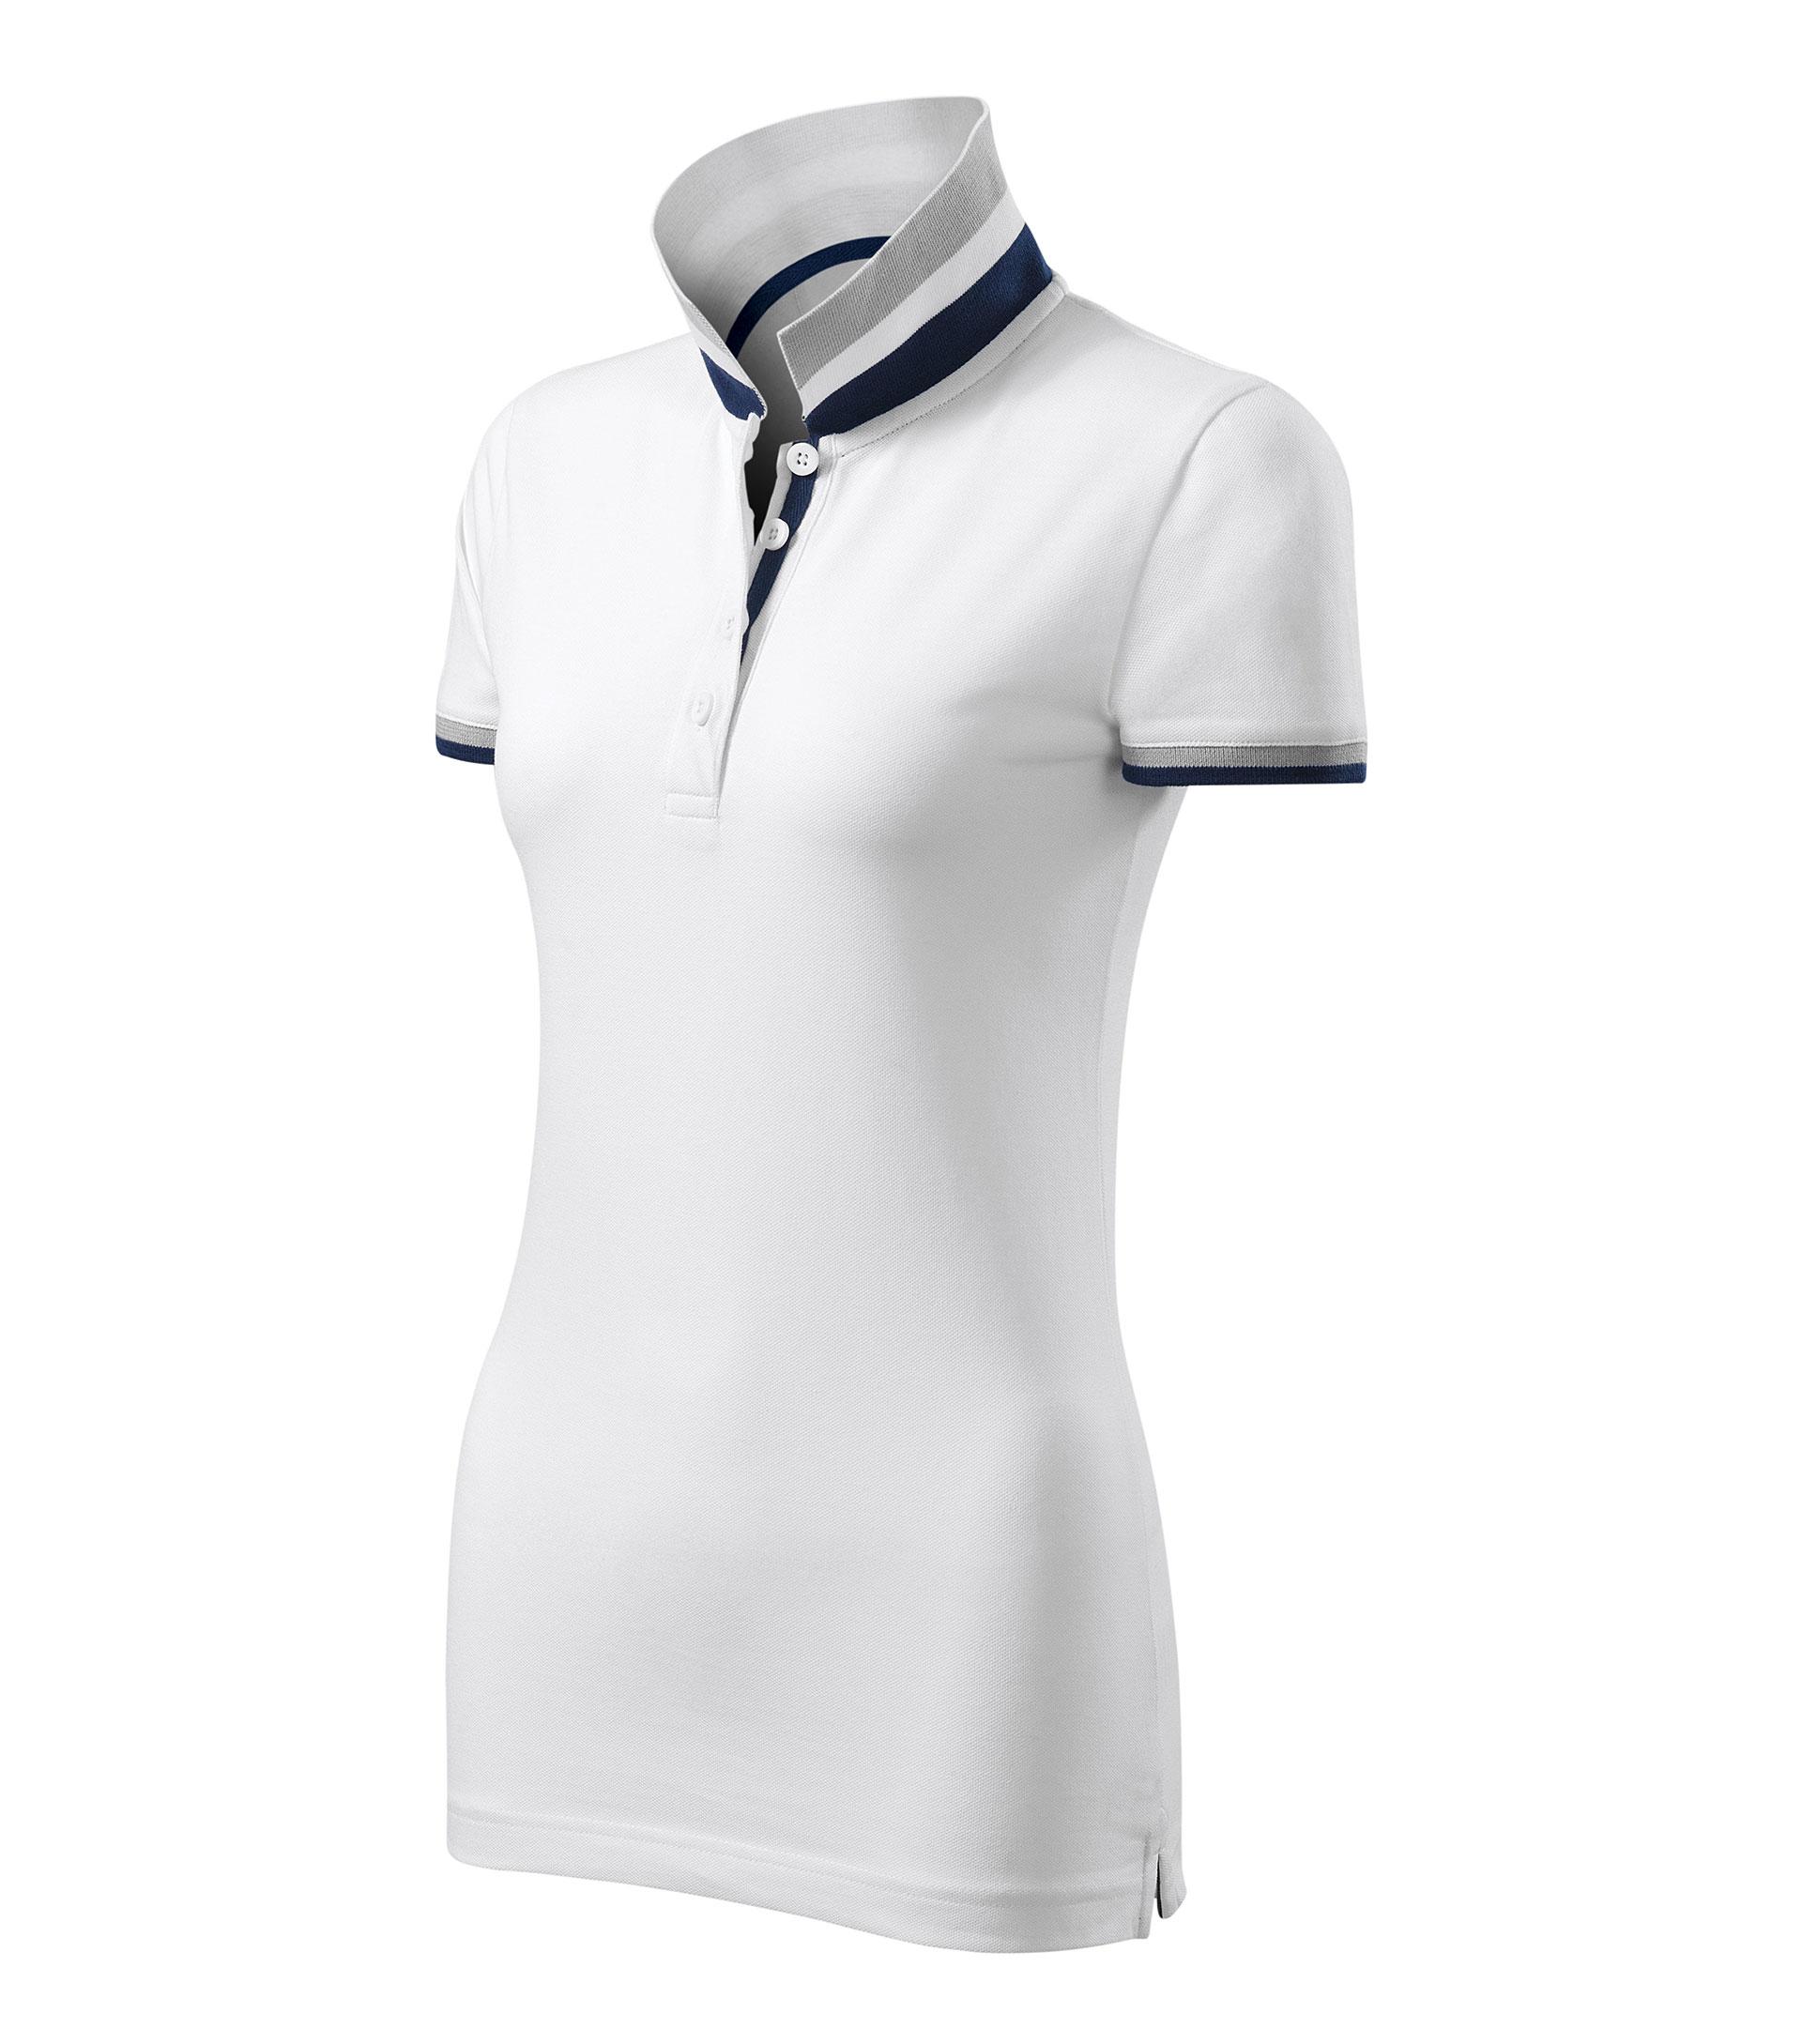 e876b5010c Malfini női galléros póló Collar Up fehér S